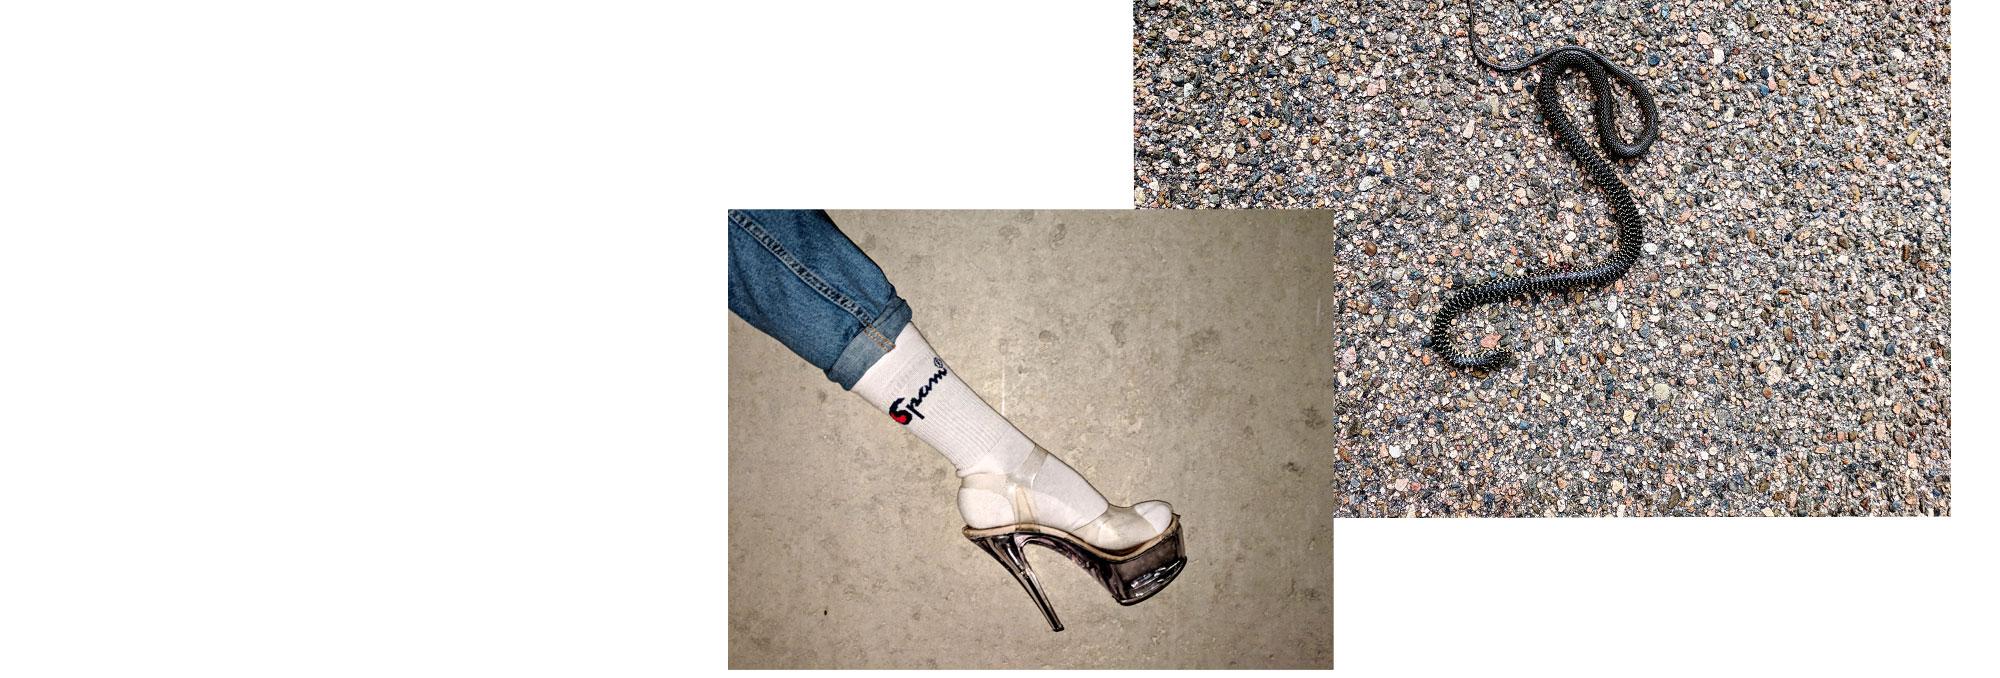 Original Spampion socks with snake